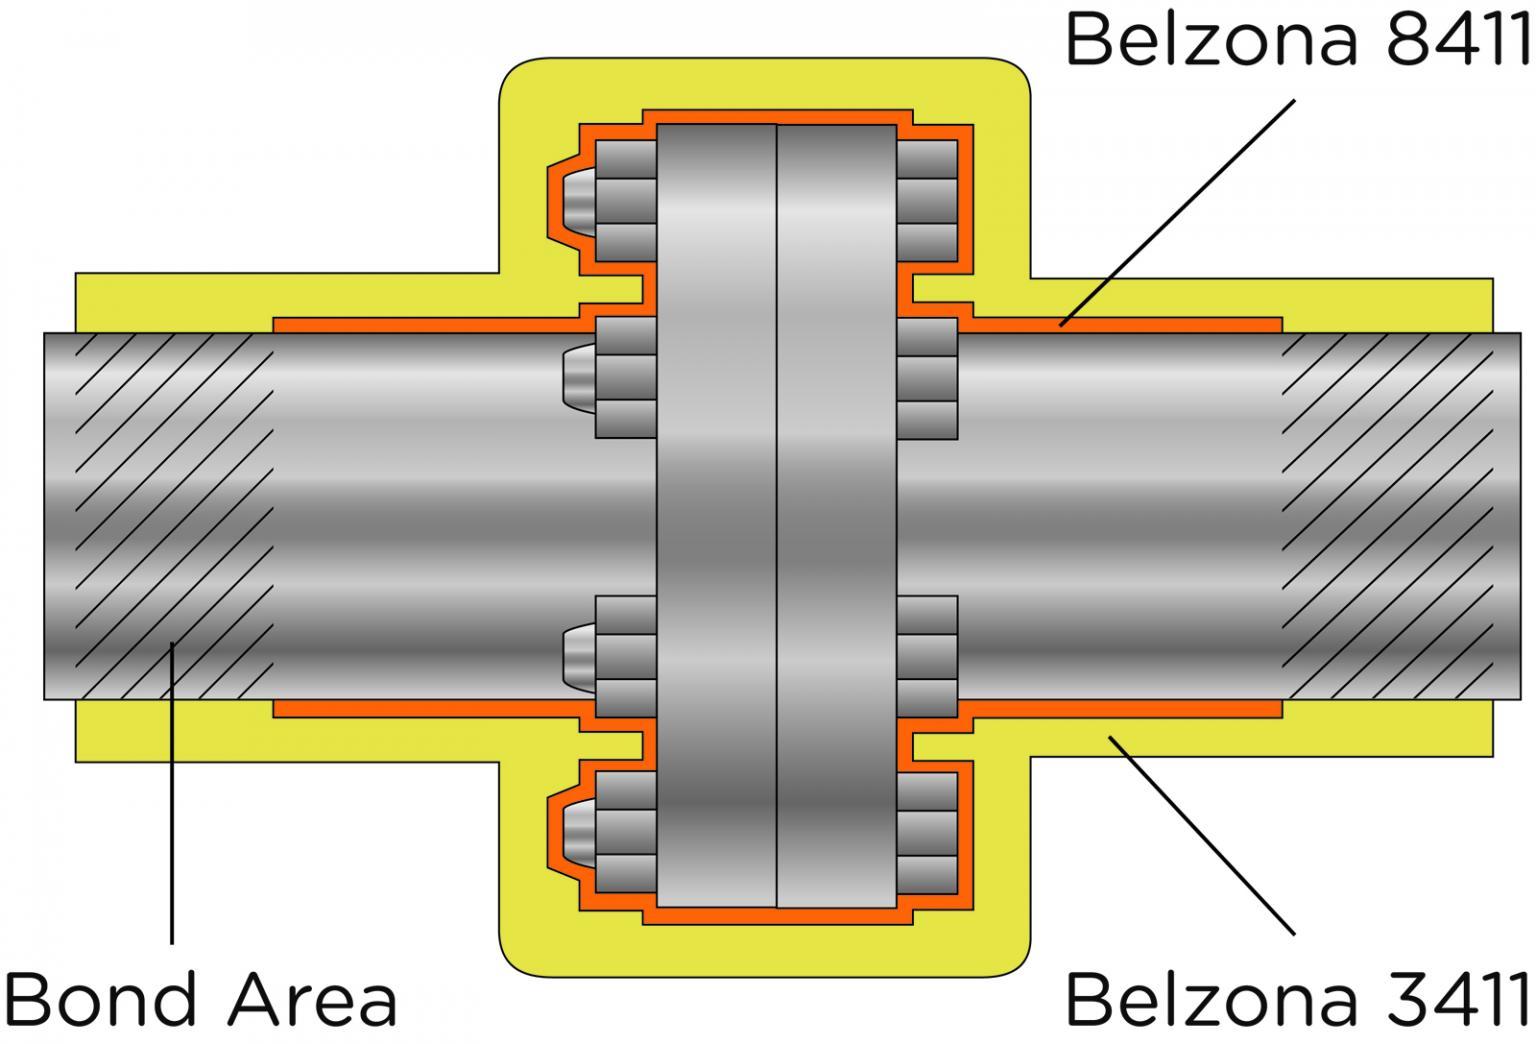 Belzona flange encapsulating system